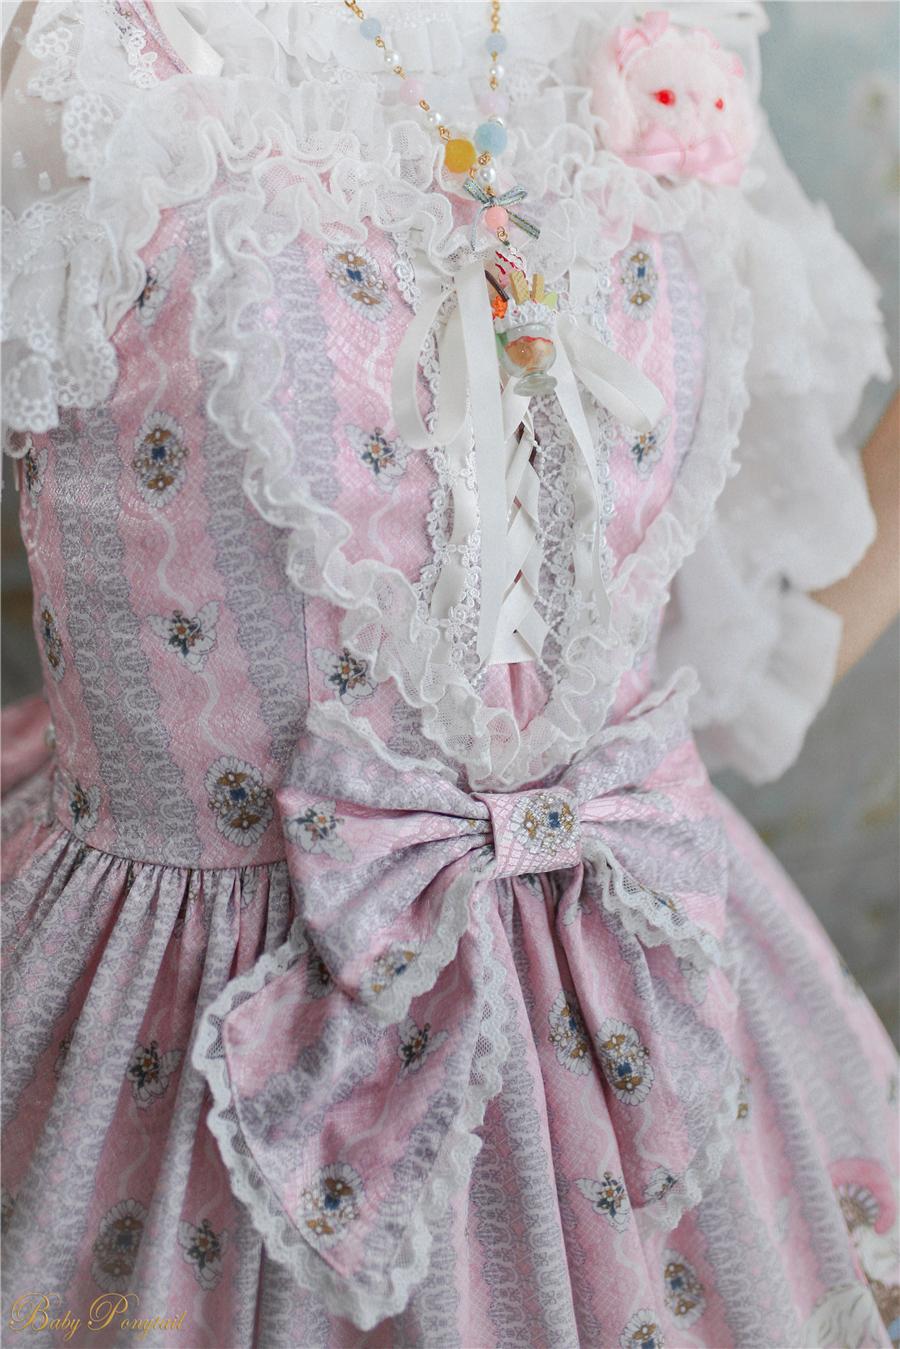 BabyPonytail_Model Photo_My Favorite Companion_JSK Pink_Kaka_08.jpg